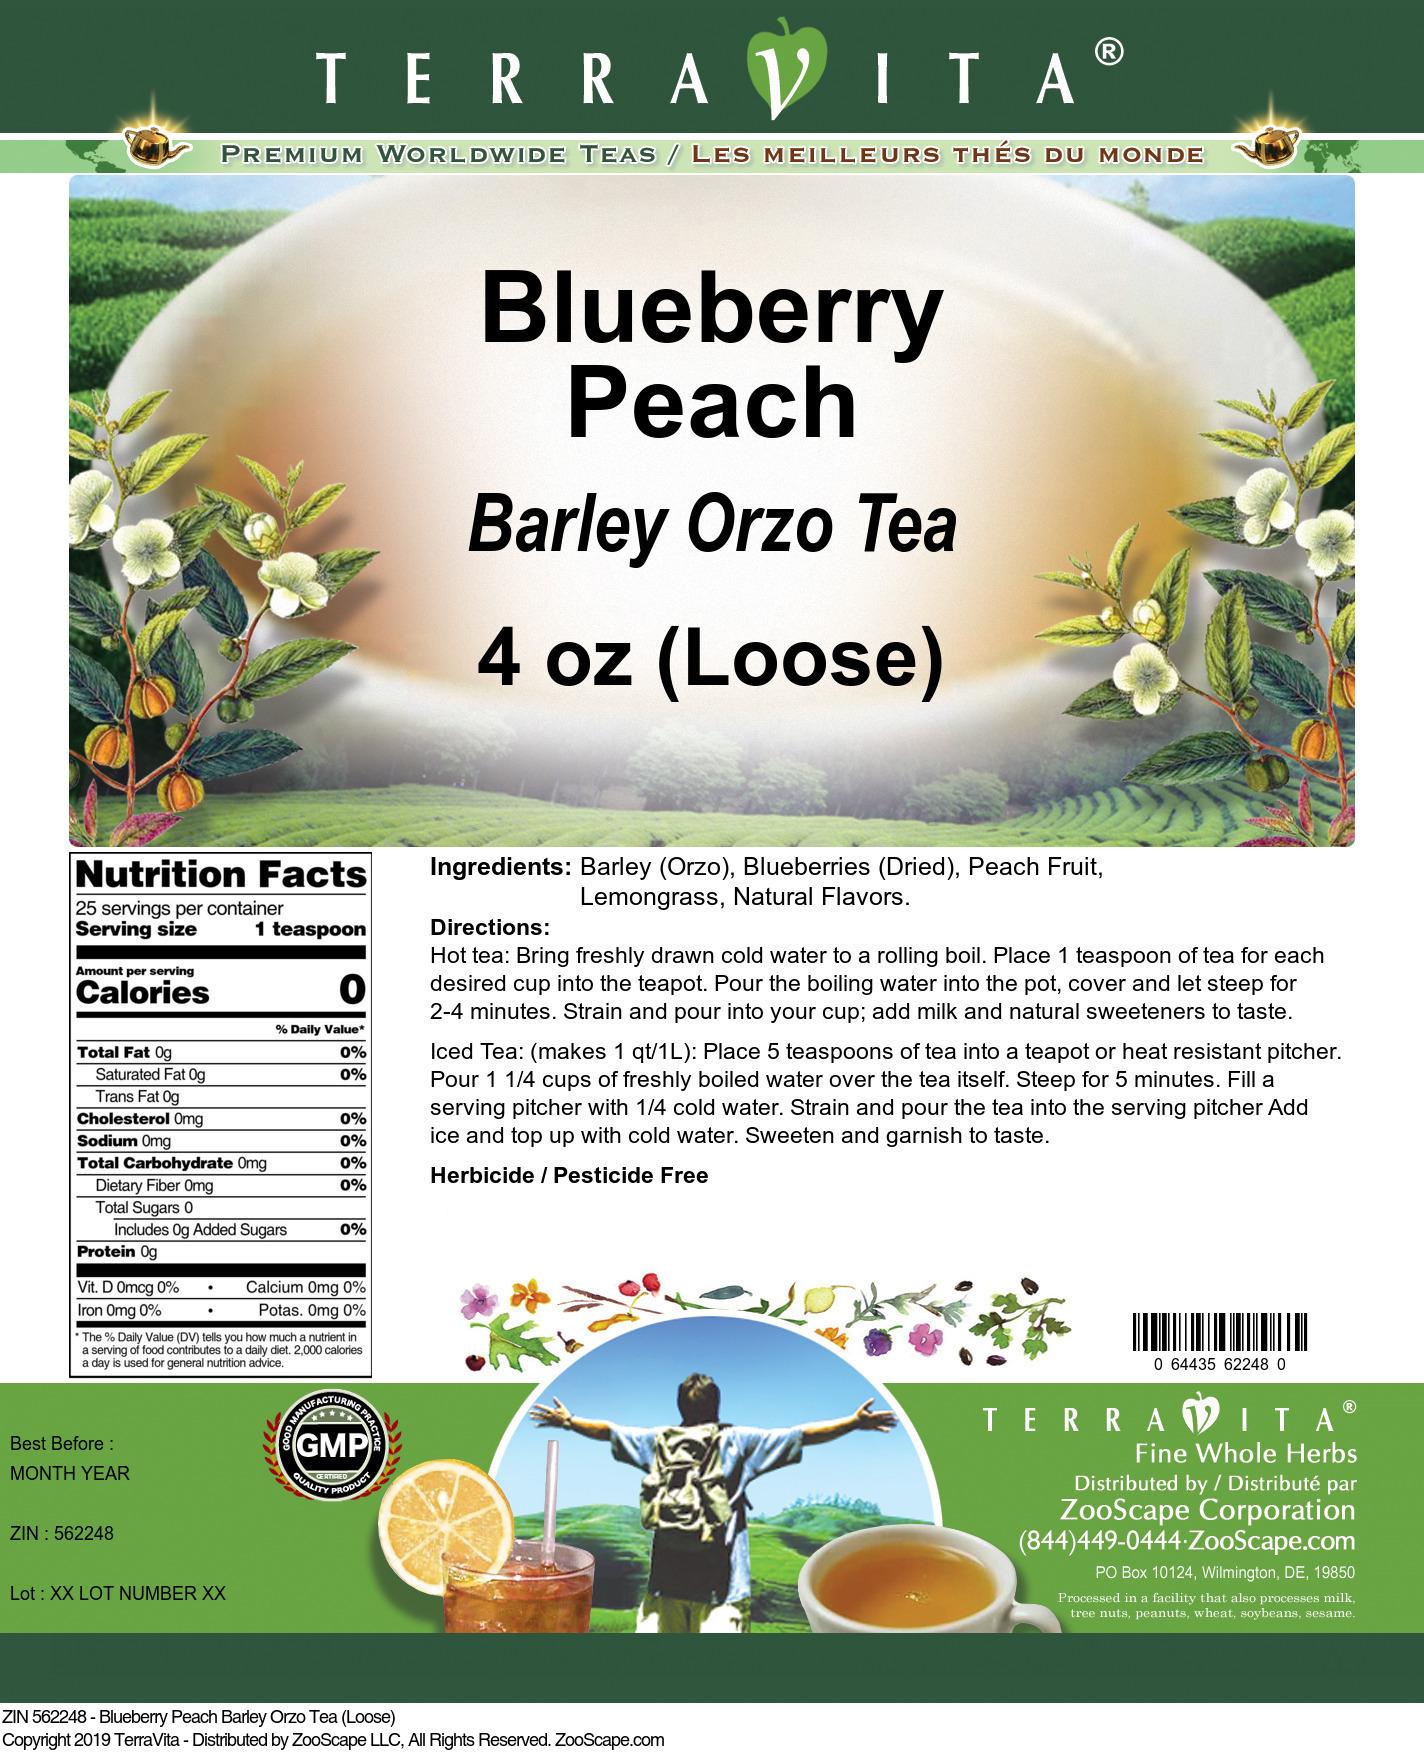 Blueberry Peach Barley Orzo Tea (Loose)